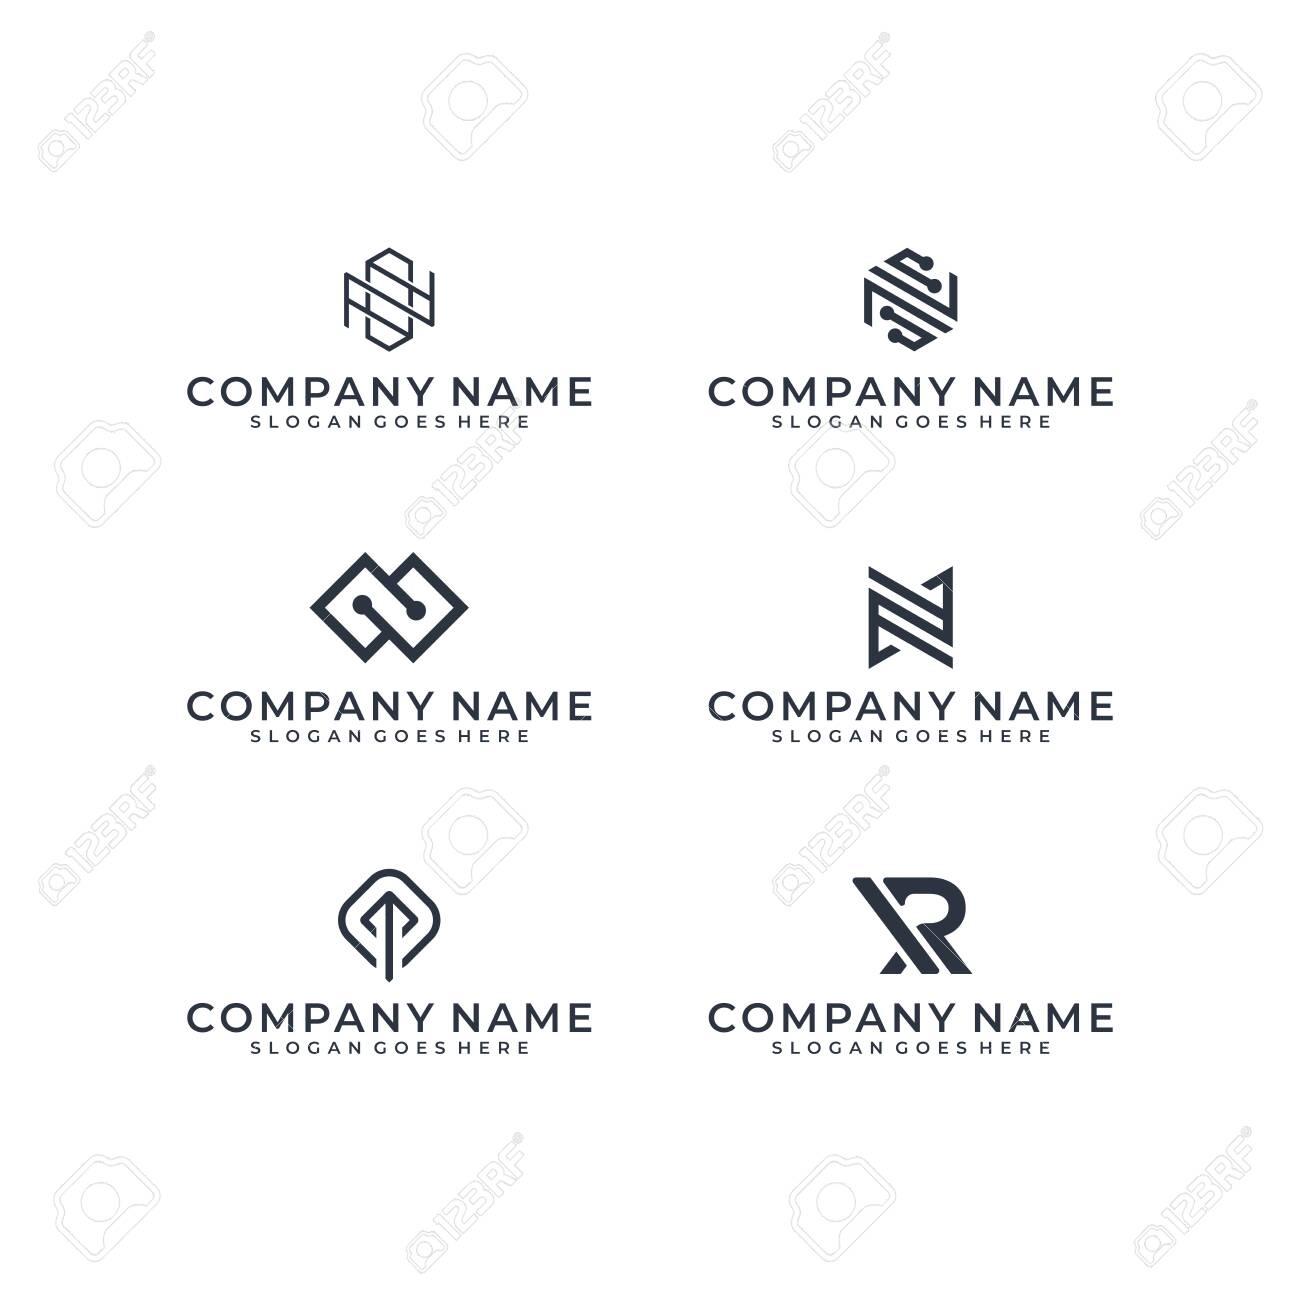 Logo design bundle inspiration - 140408886